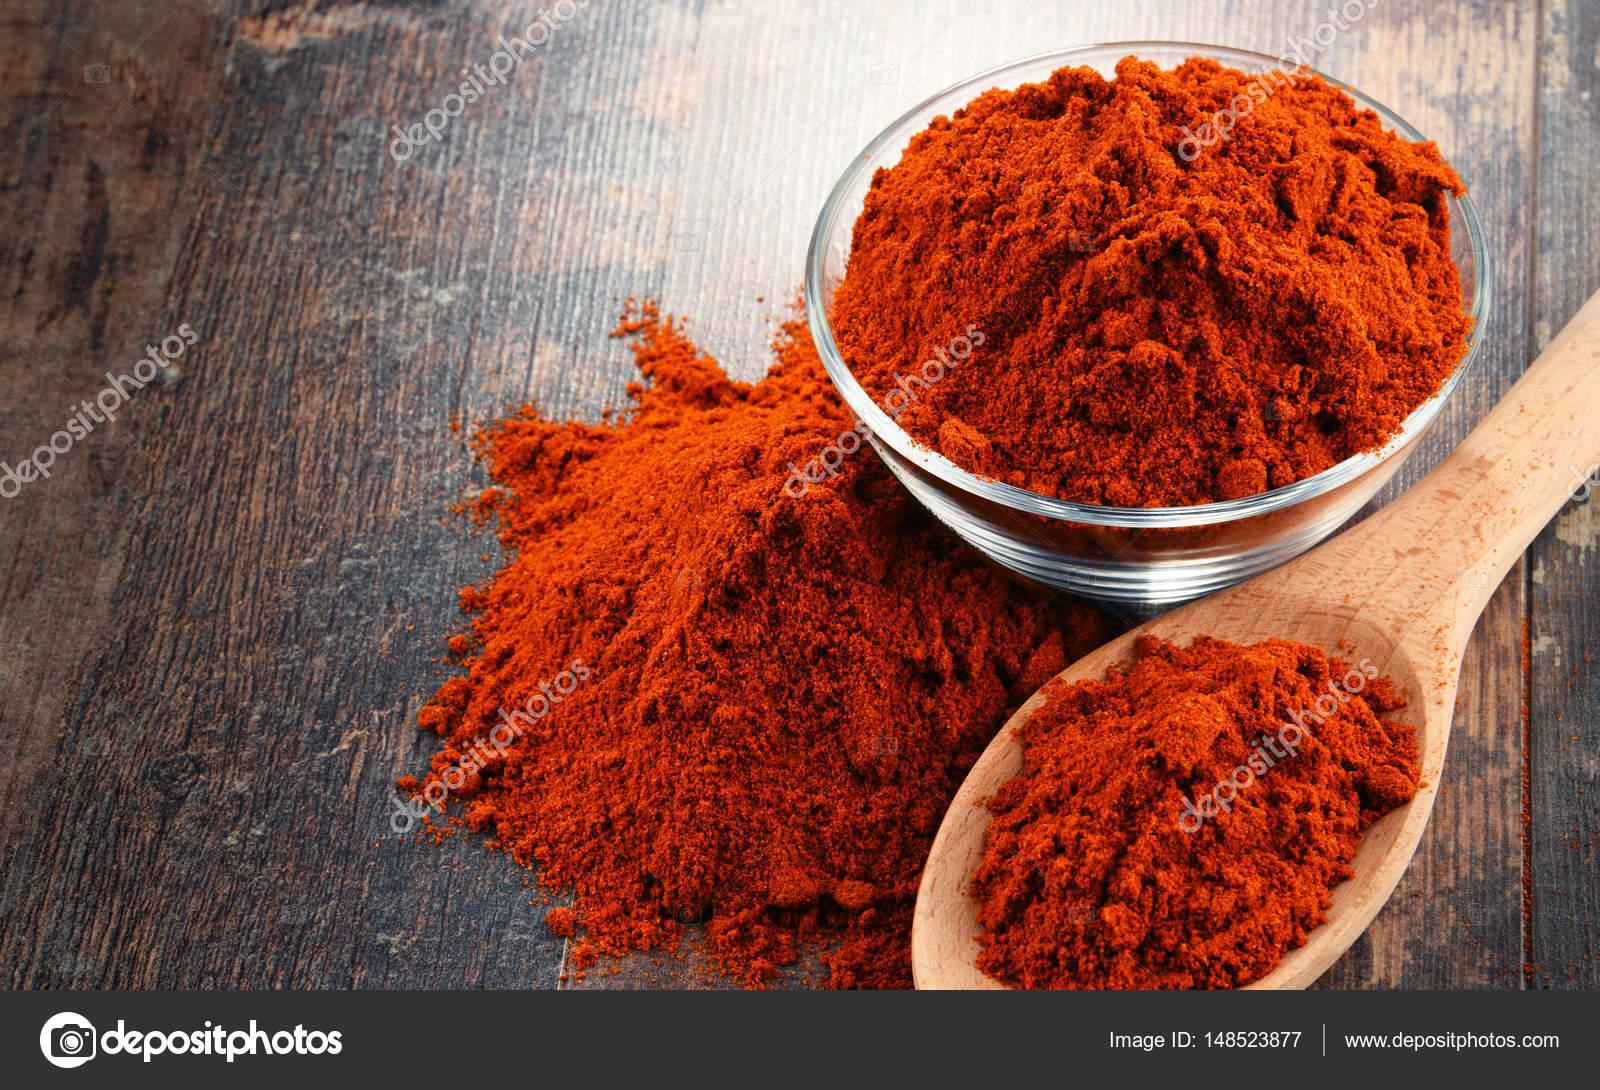 poudre chili composition